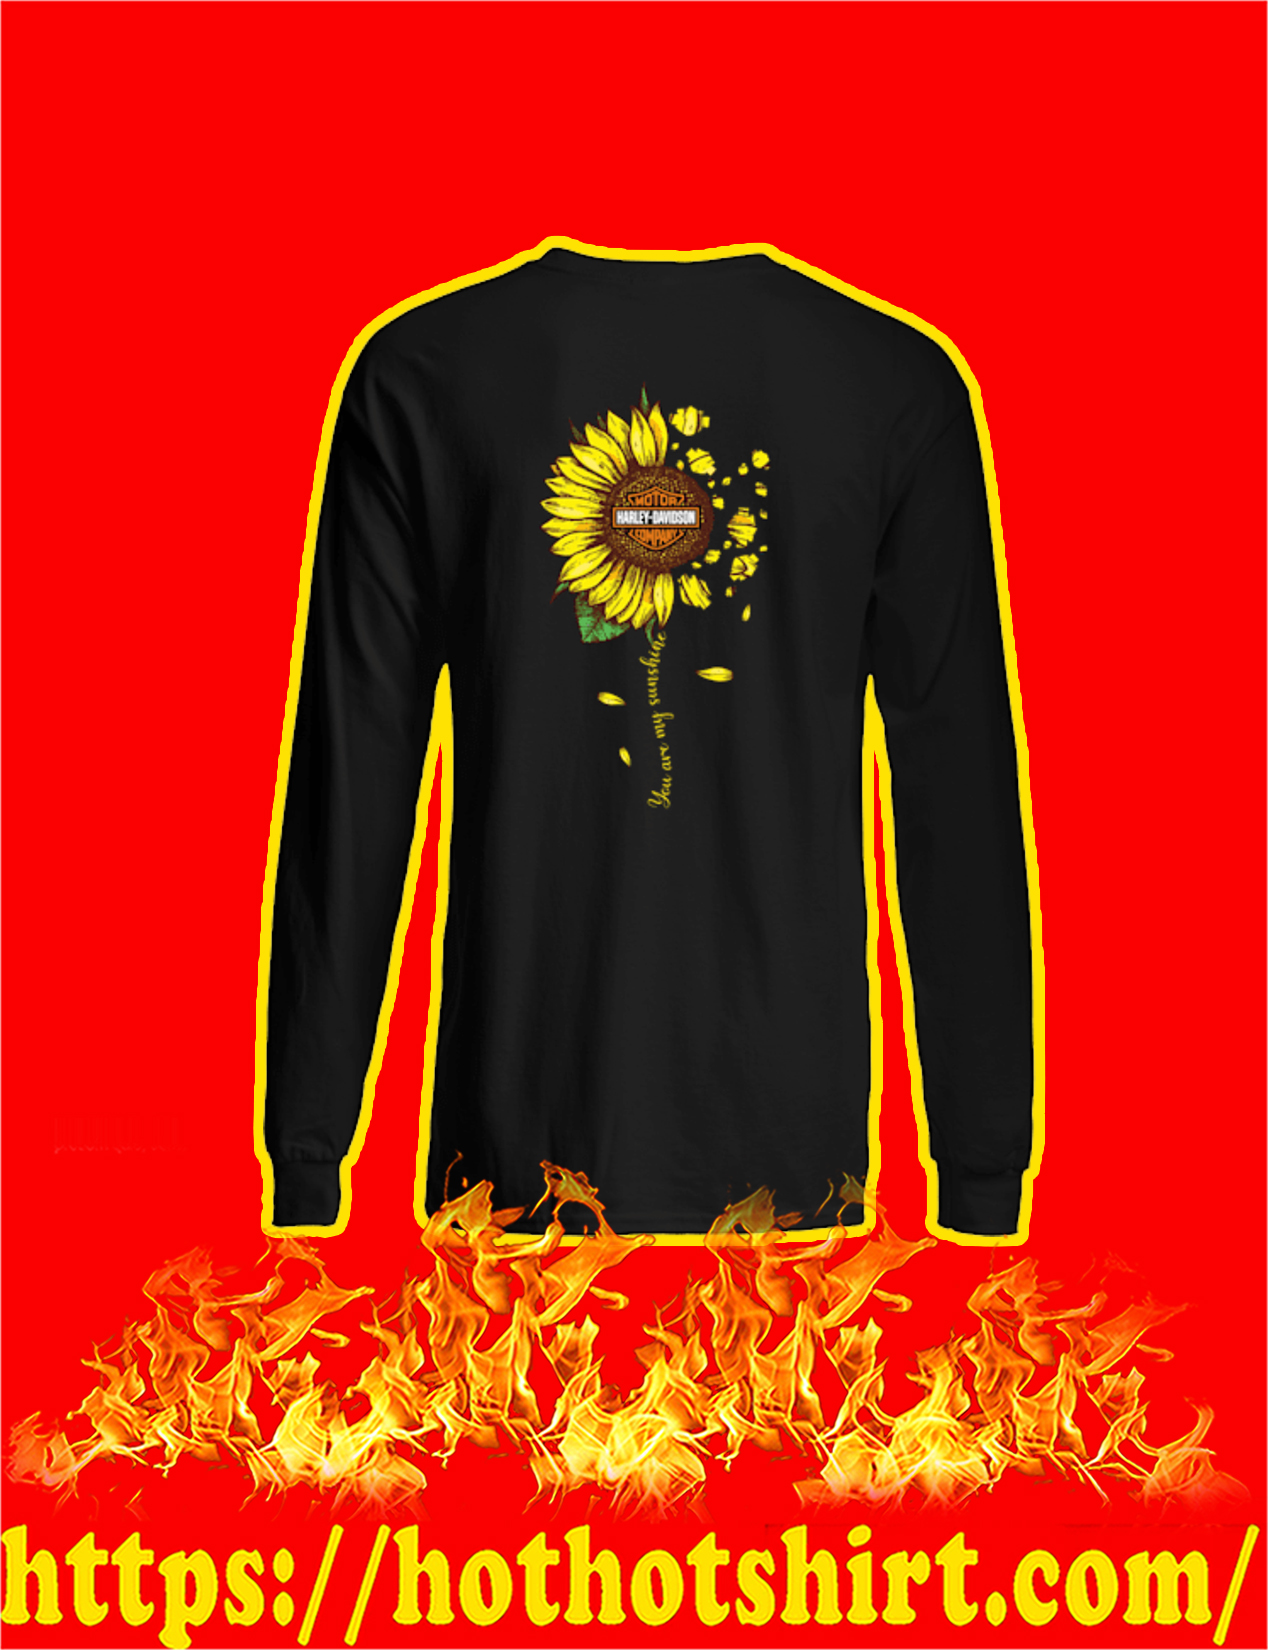 Harley-Davidson Sunflower You Are My Sunshine Long Sleeved Shirt